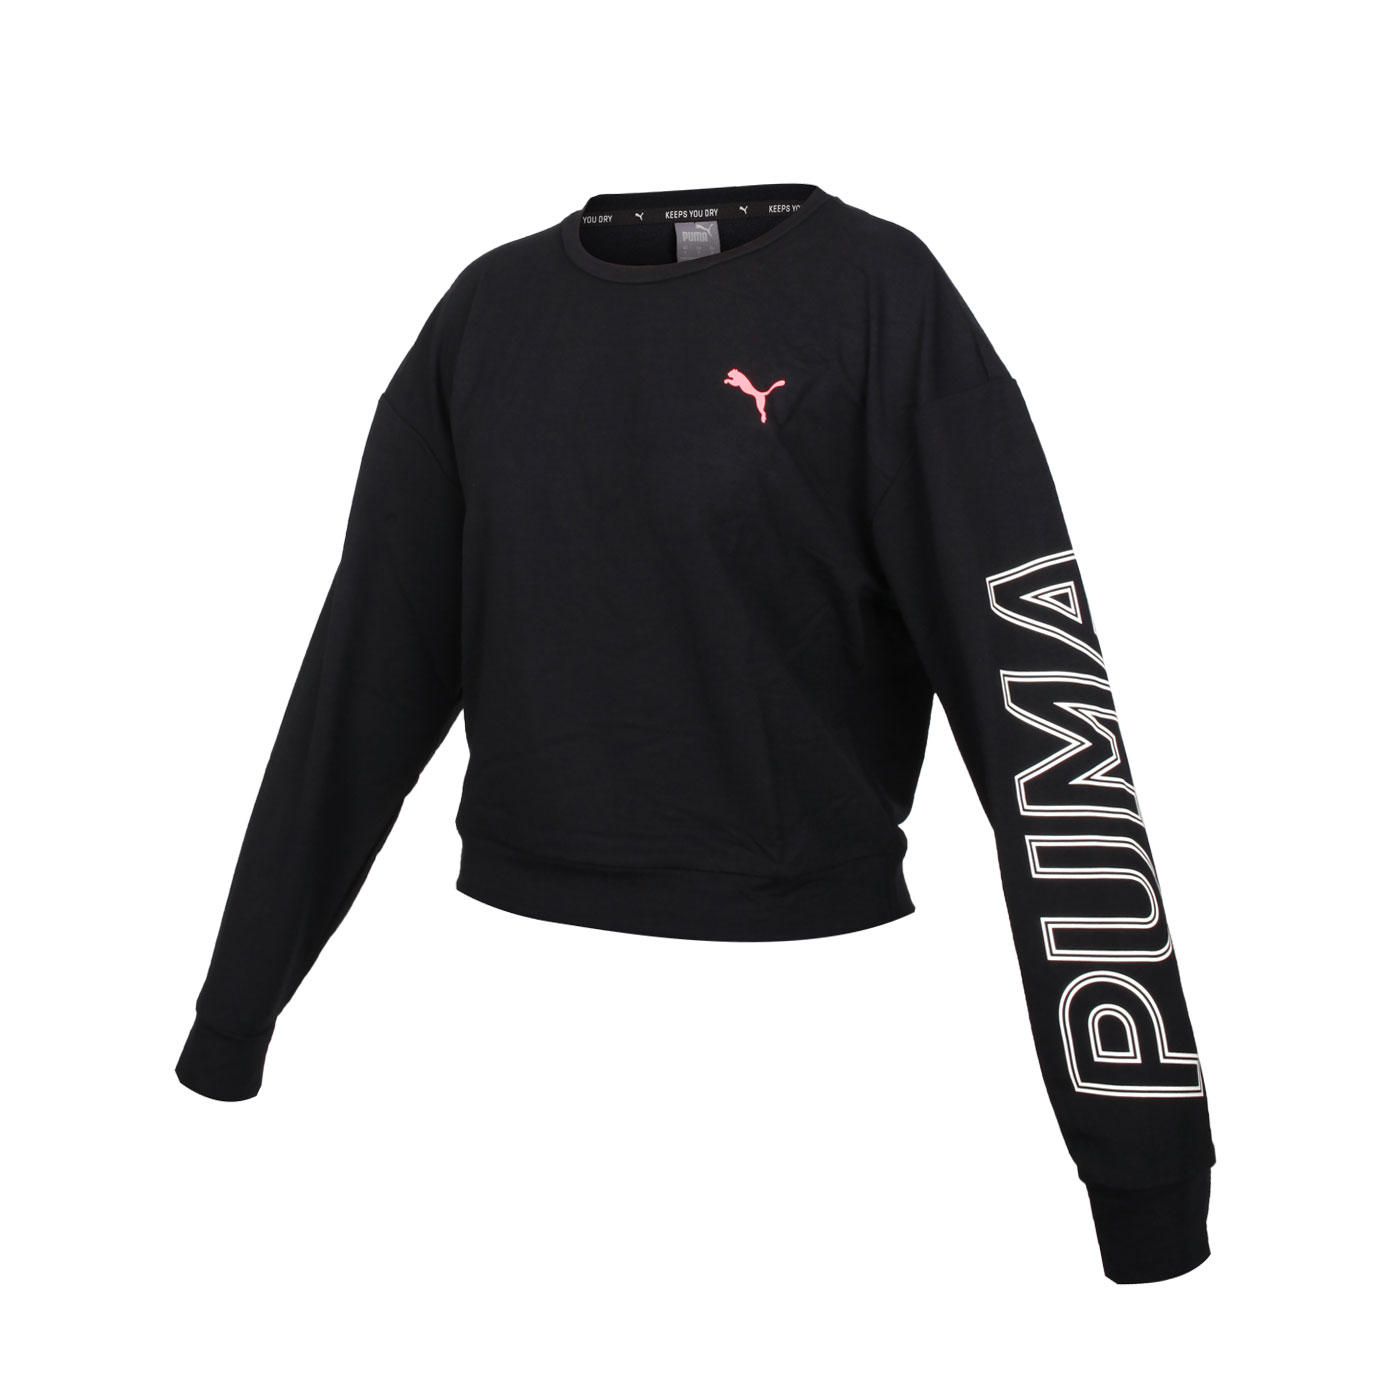 PUMA 女款基本系列短版長袖T恤 58353961 - 黑白粉